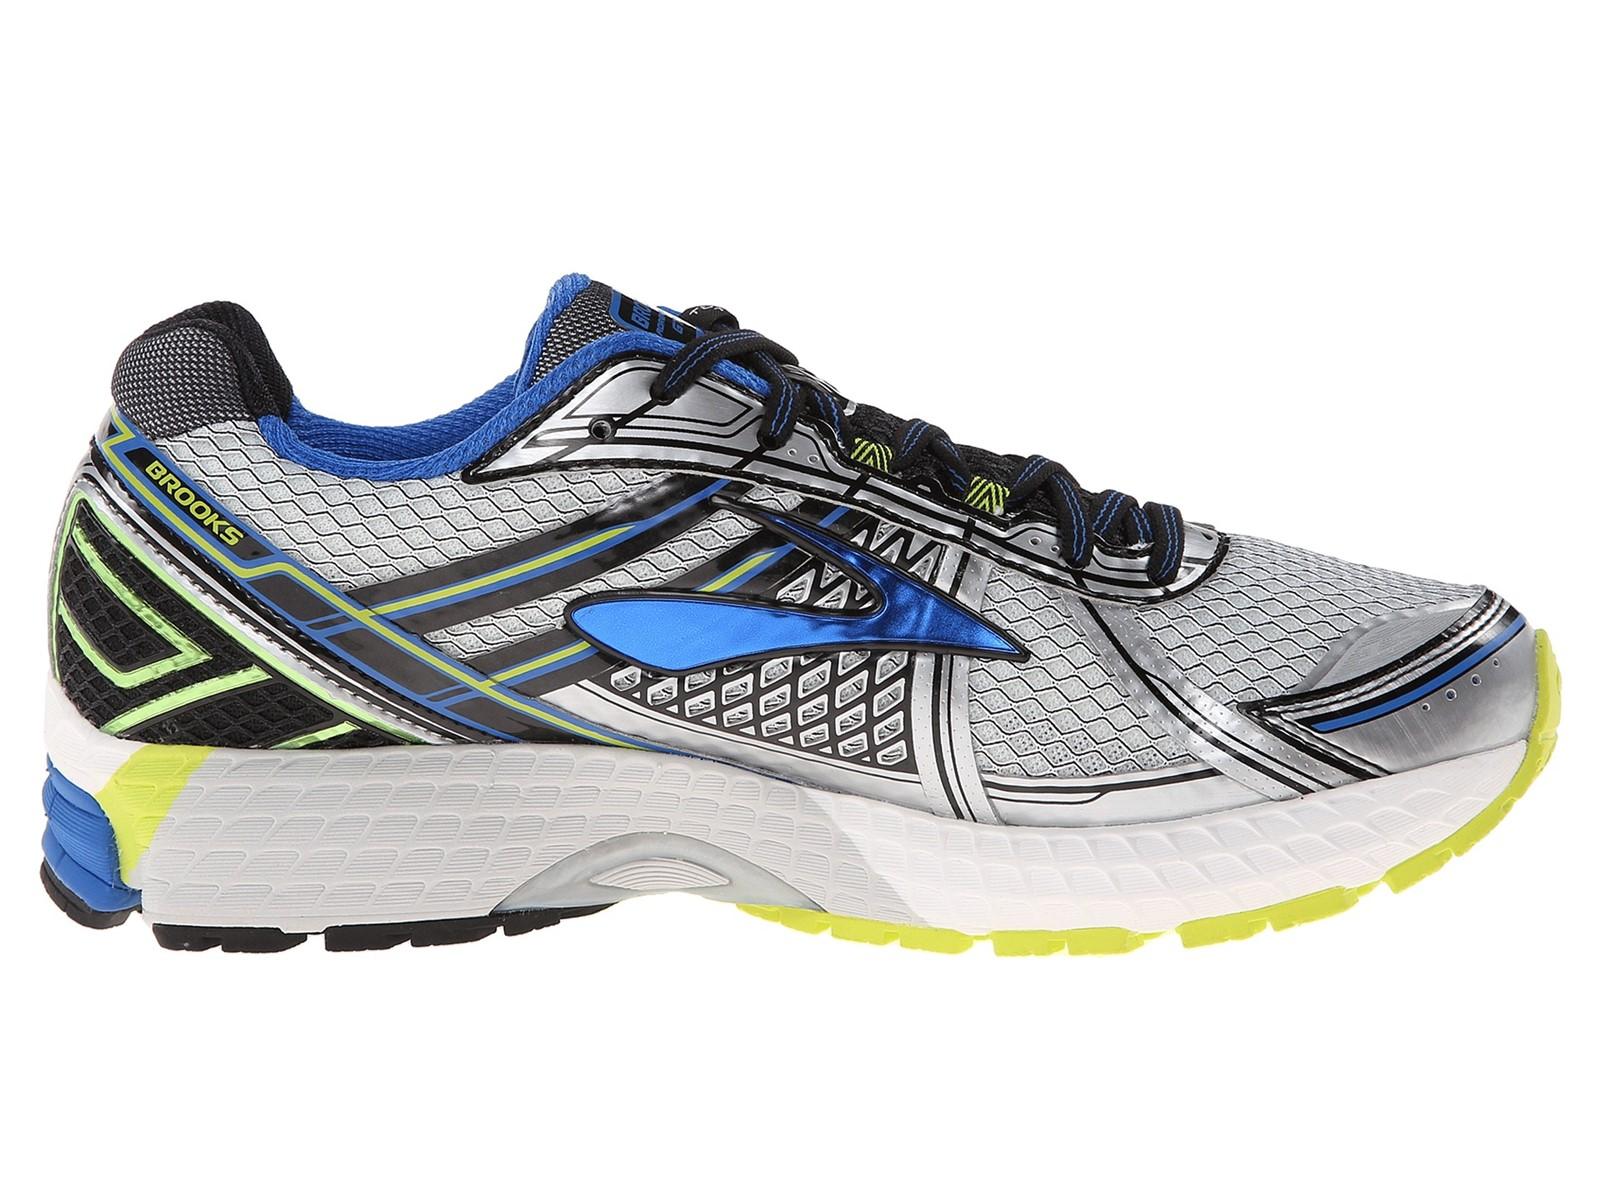 New Brooks Adrenaline GTS 15 Running Shoes Mens Size 11 5 | EBay